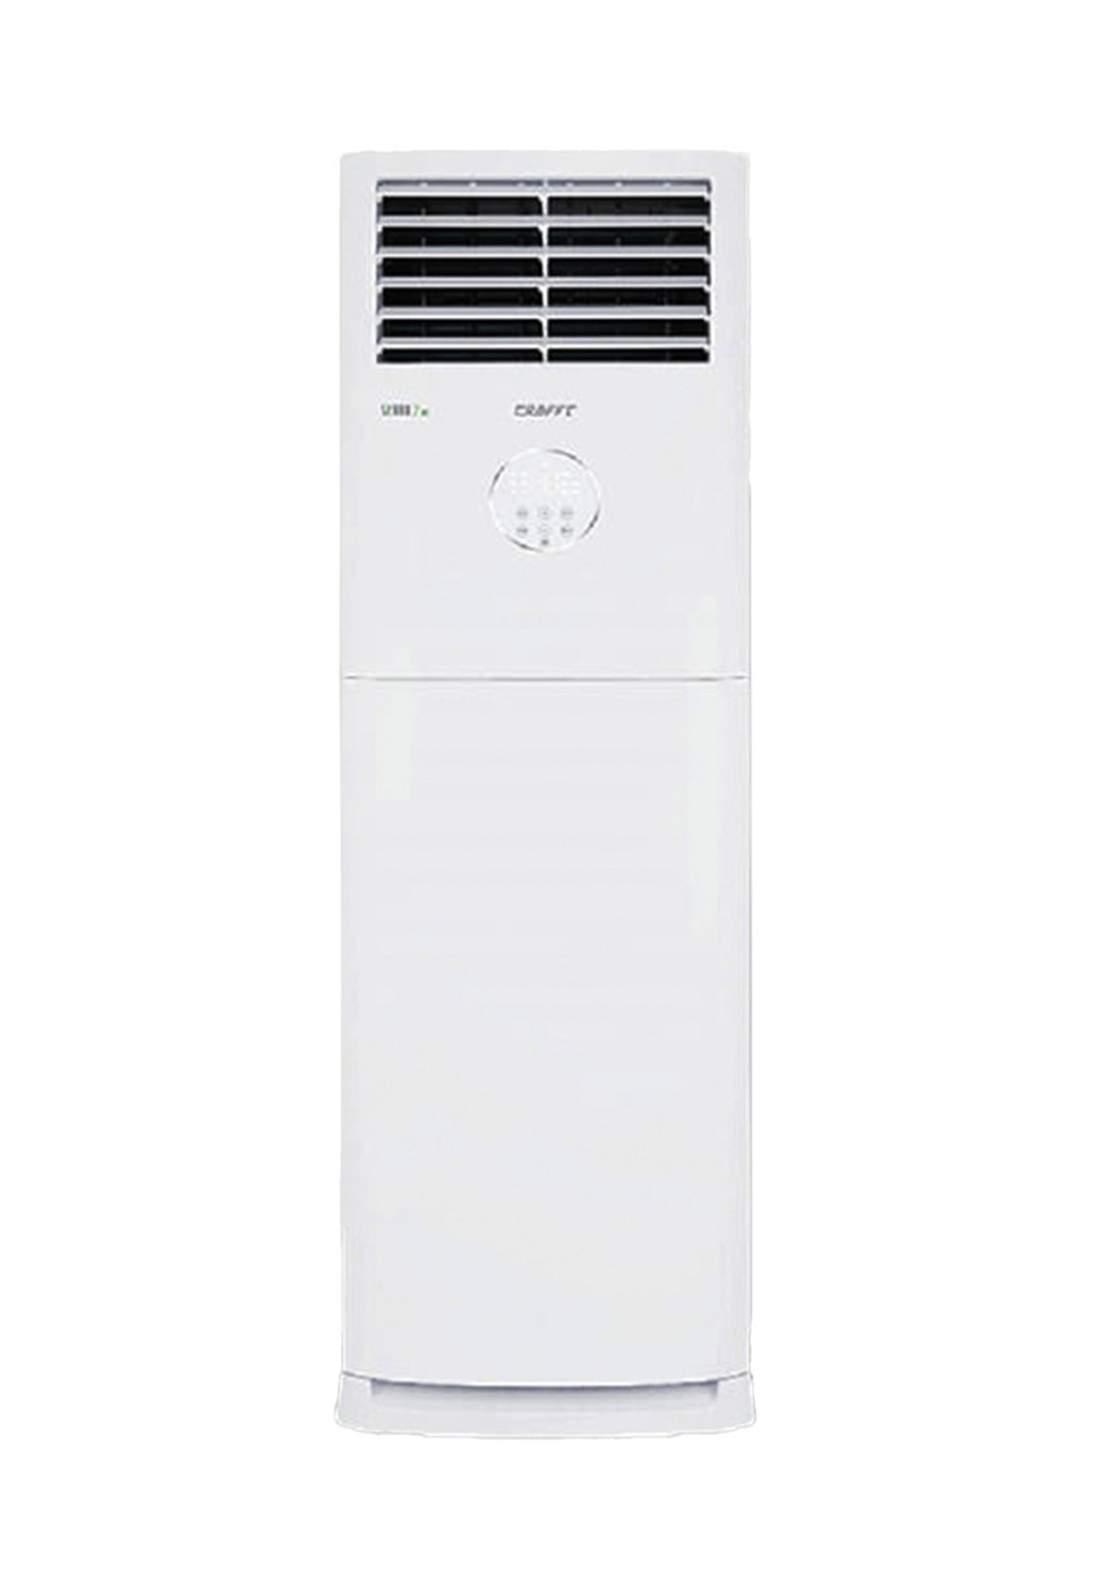 سبلت عامودي5  طن حار بارد سيرا2 غاز  Crafft R410